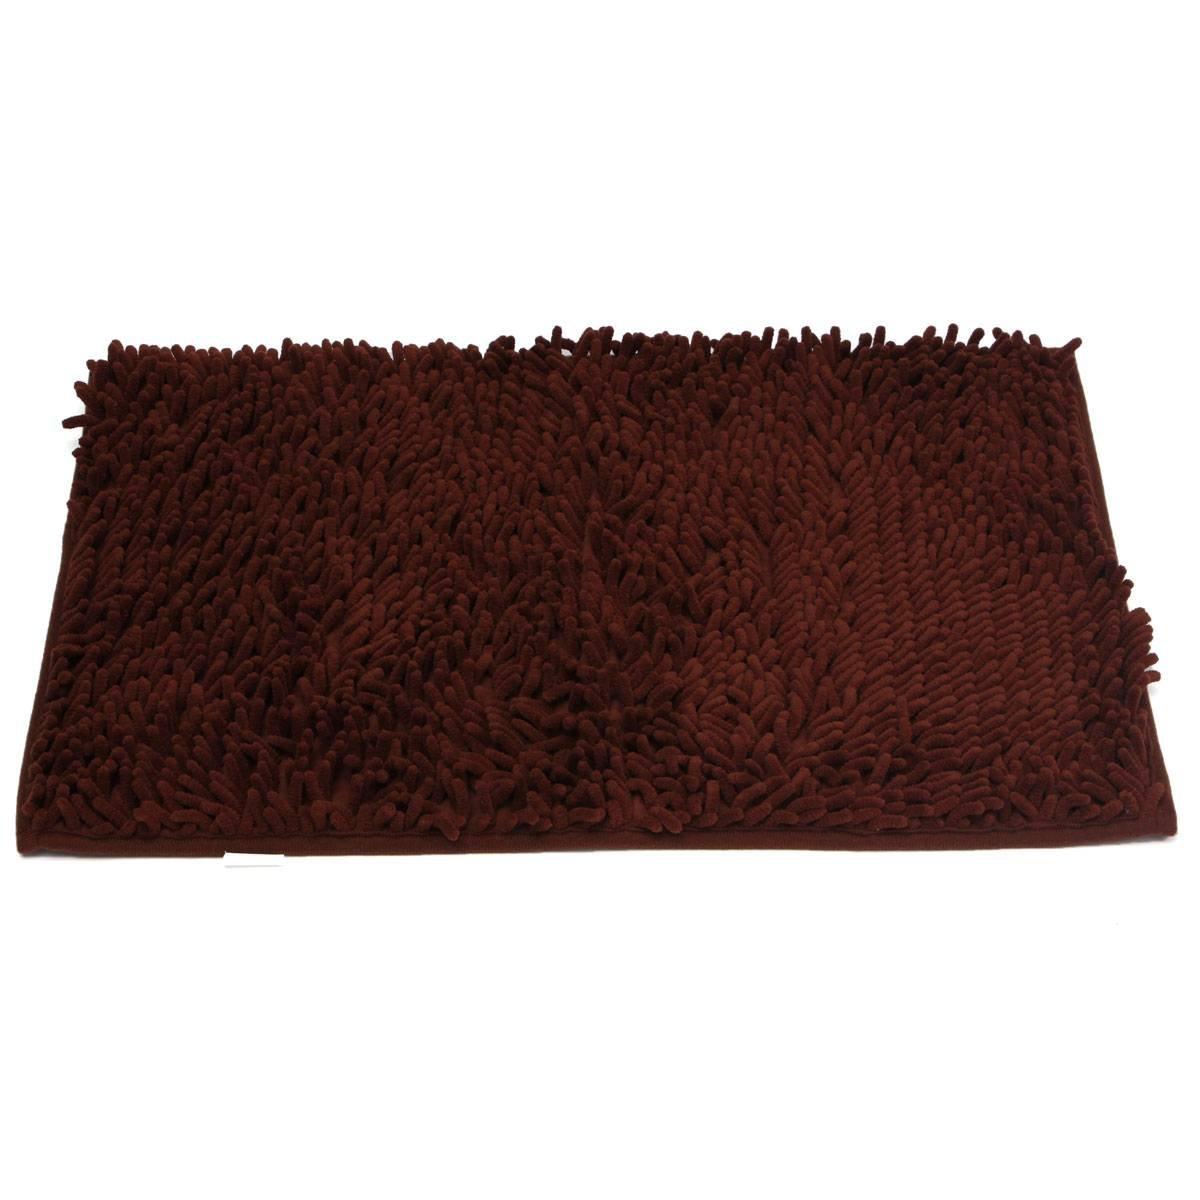 1pcs Washable Bathroom New Shaggy Rugs Non Slip Bath Mat